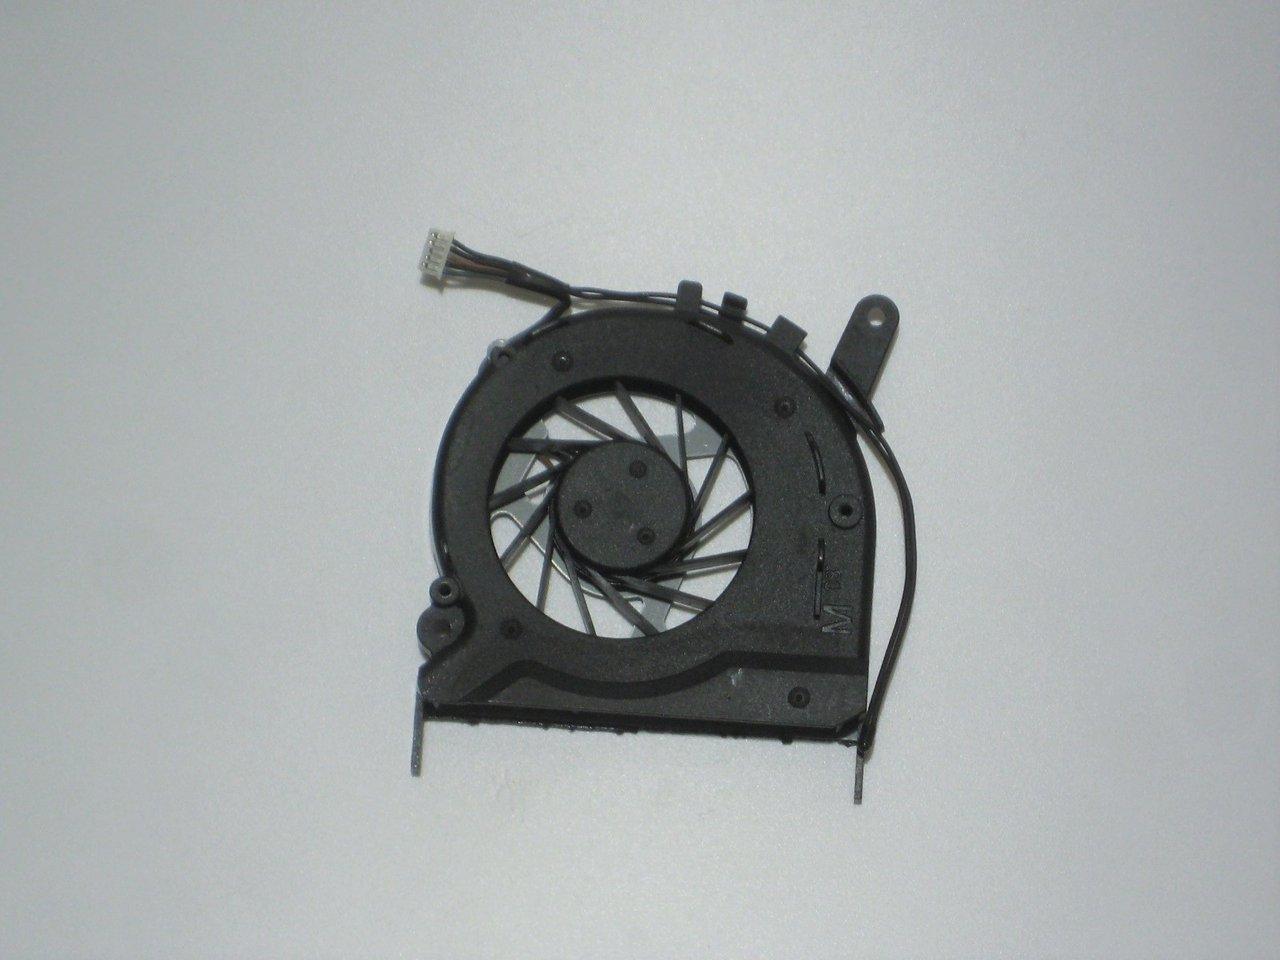 SUNON ZB0507PGV1-6A Lüfter für ACER / eMachines Notebook